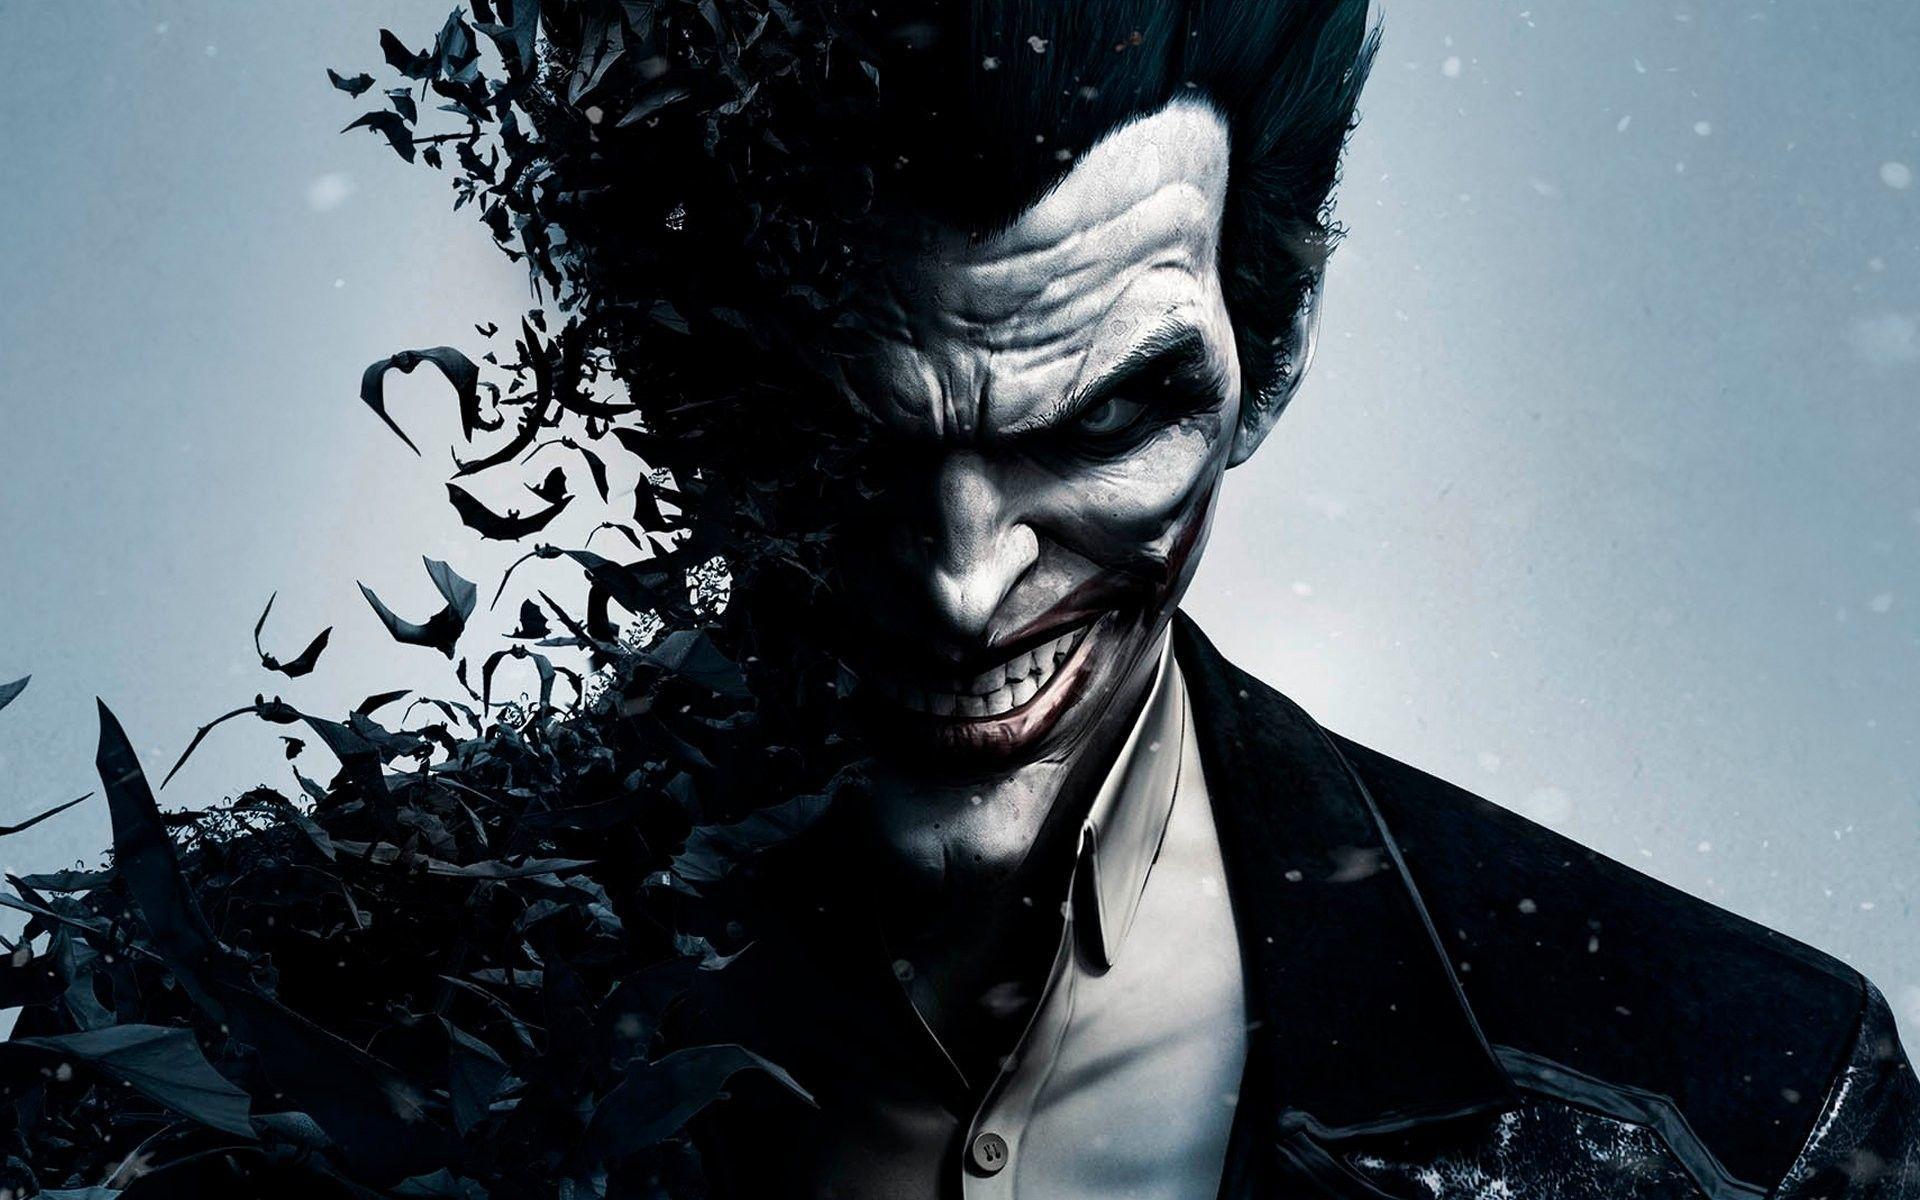 Full Hd Wallpapers Joker Wallpaper Cave